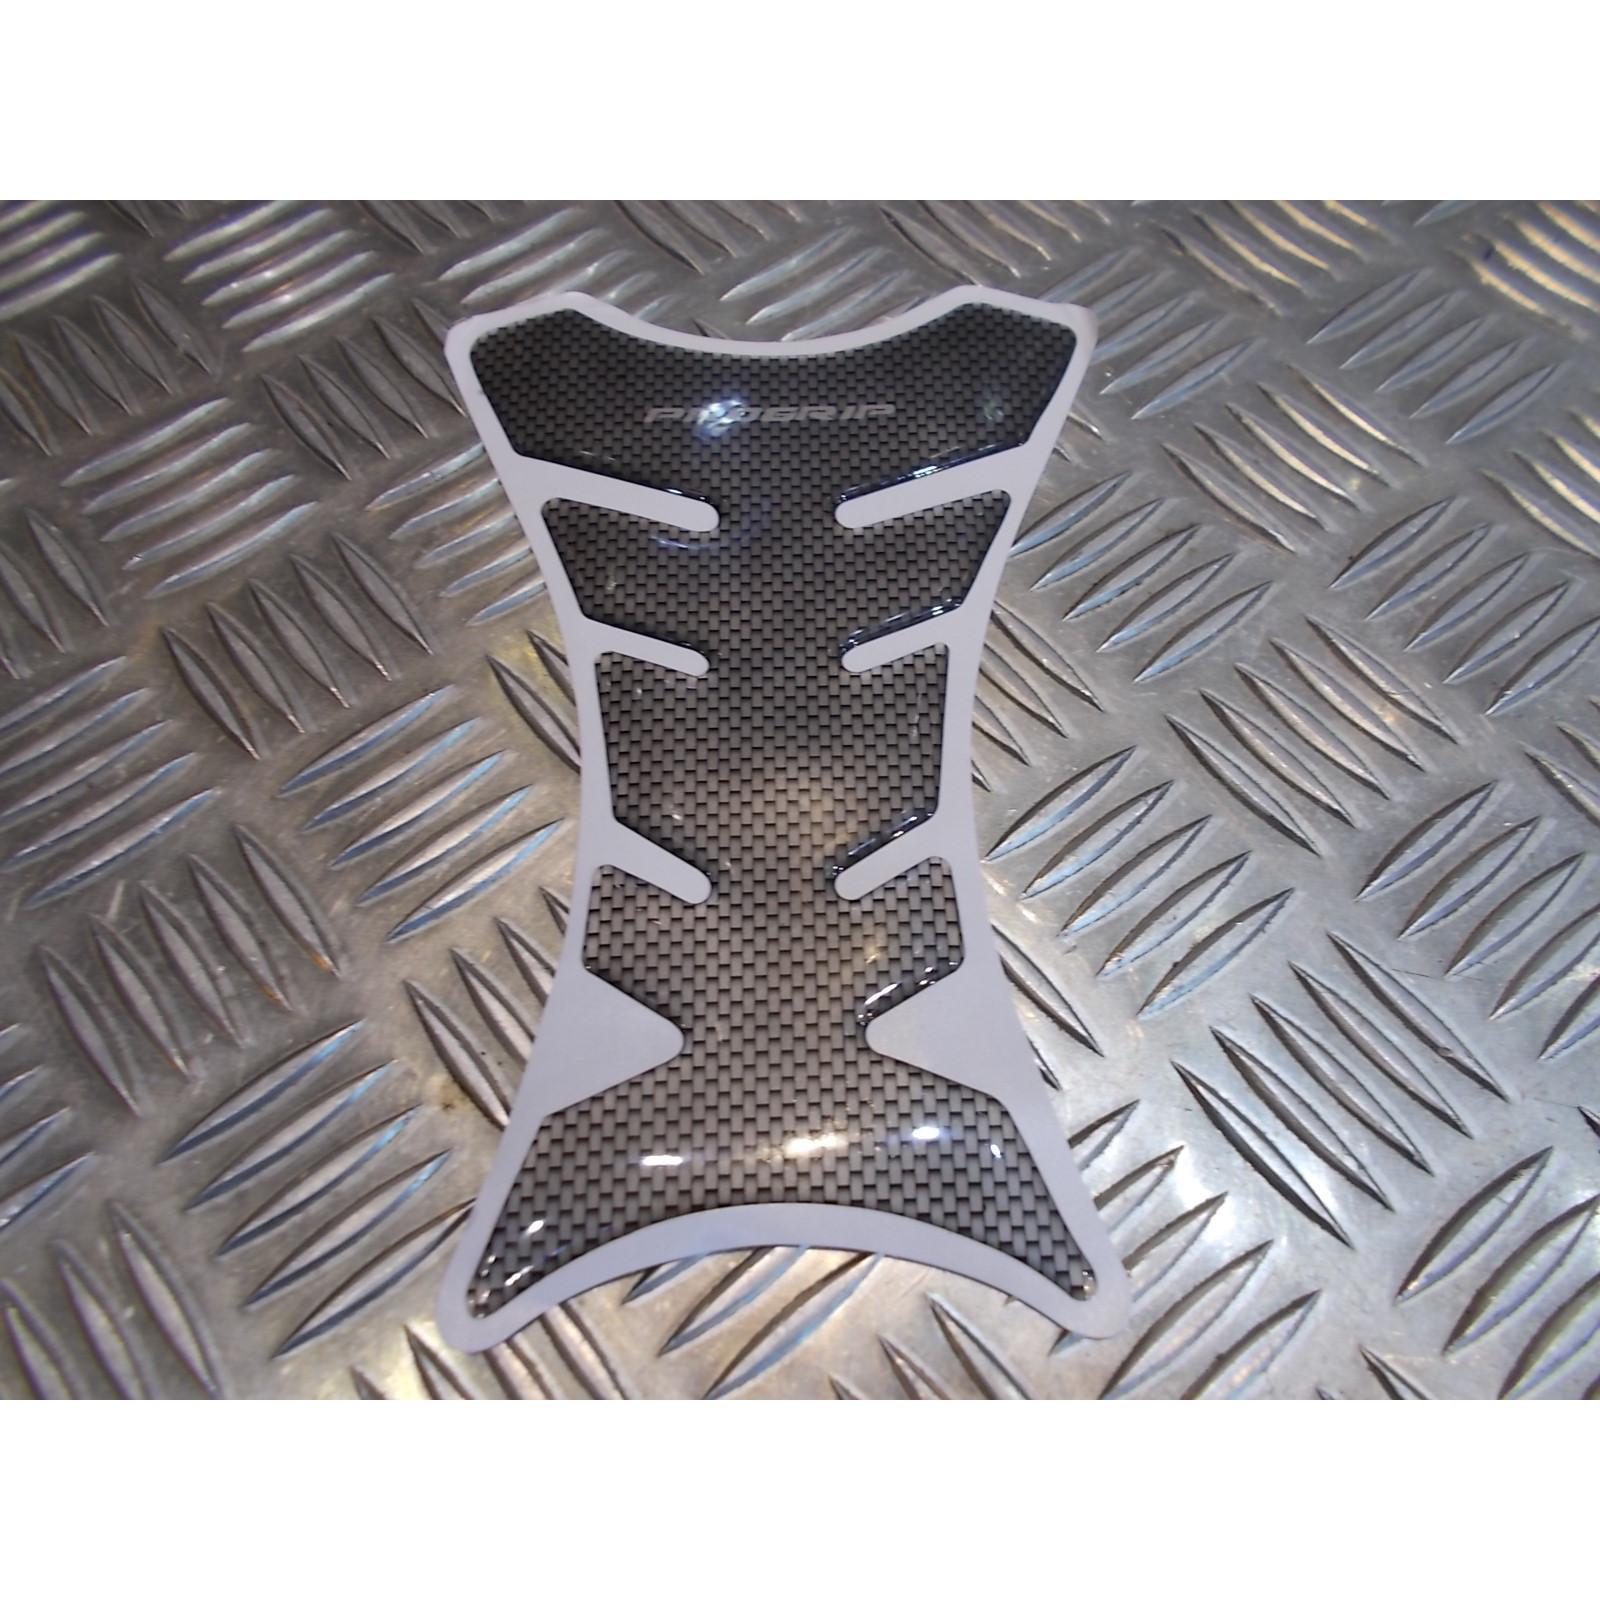 autocollant adhesif carbone protege reservoir essence moto sticker protection rayures